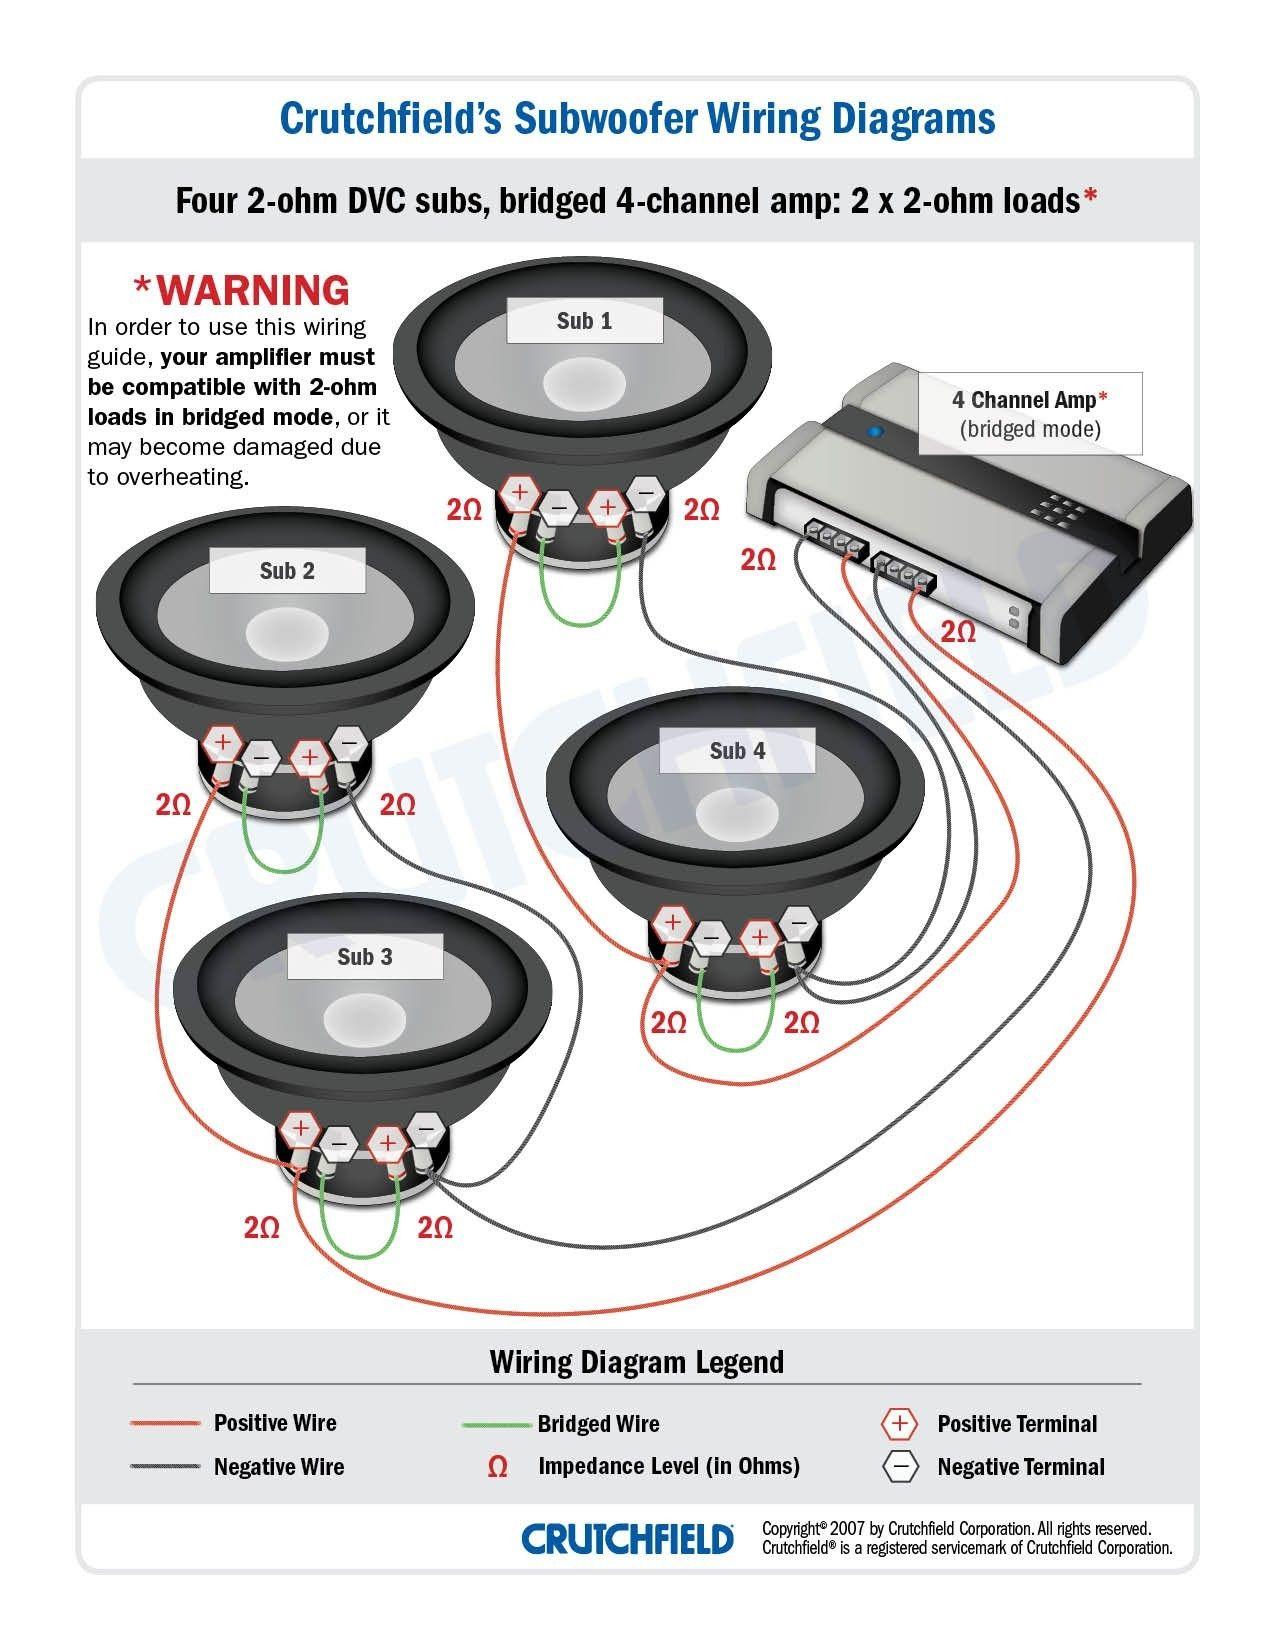 New Optimus Car Stereo Wiring Diagram #diagram #diagramtemplate  #diagramsample | Subwoofer wiring, Car audio, Car audio installationPinterest